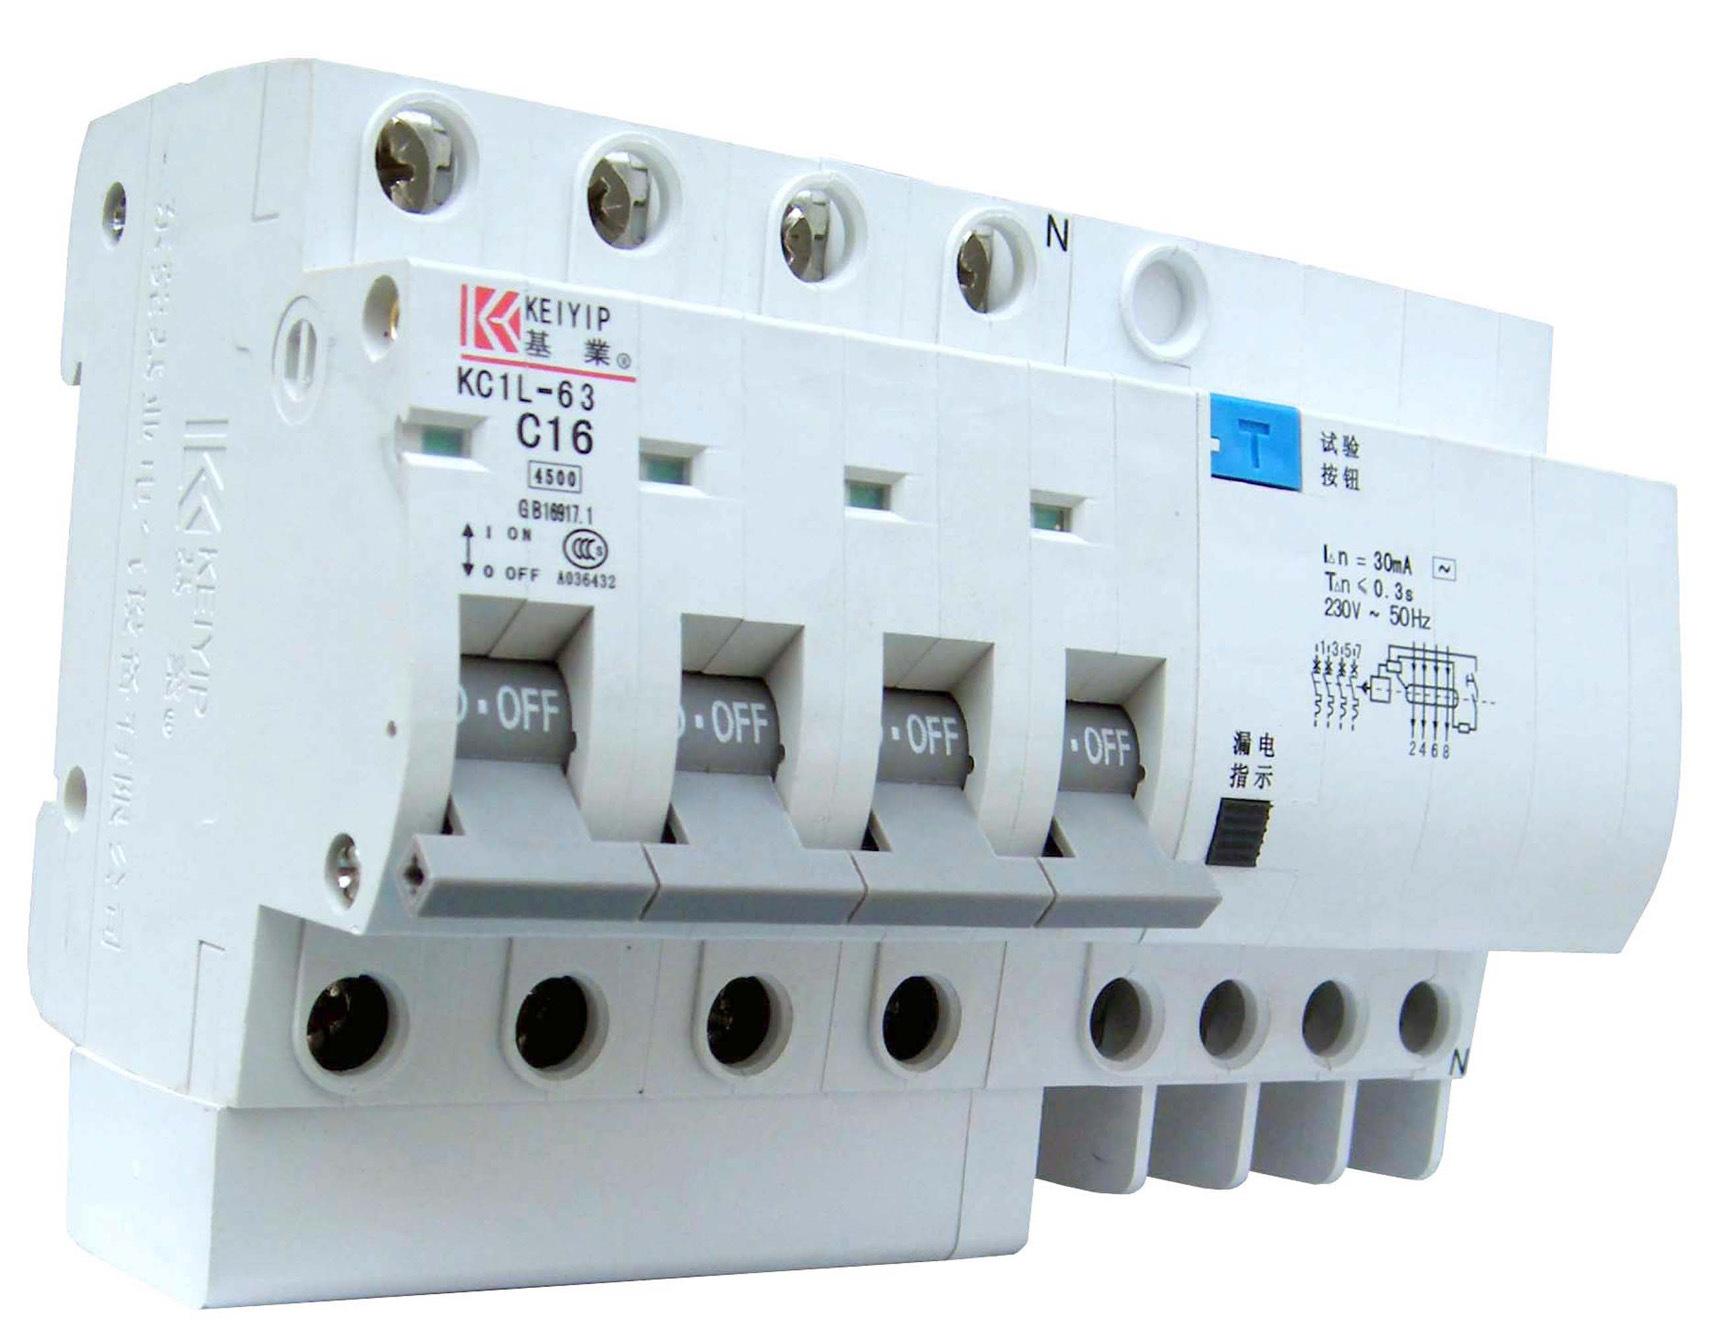 circuit breaker portable rcd rcd05 china circuit breaker rcdcircuit breaker kc163c164p china mini circuit breaker circuit